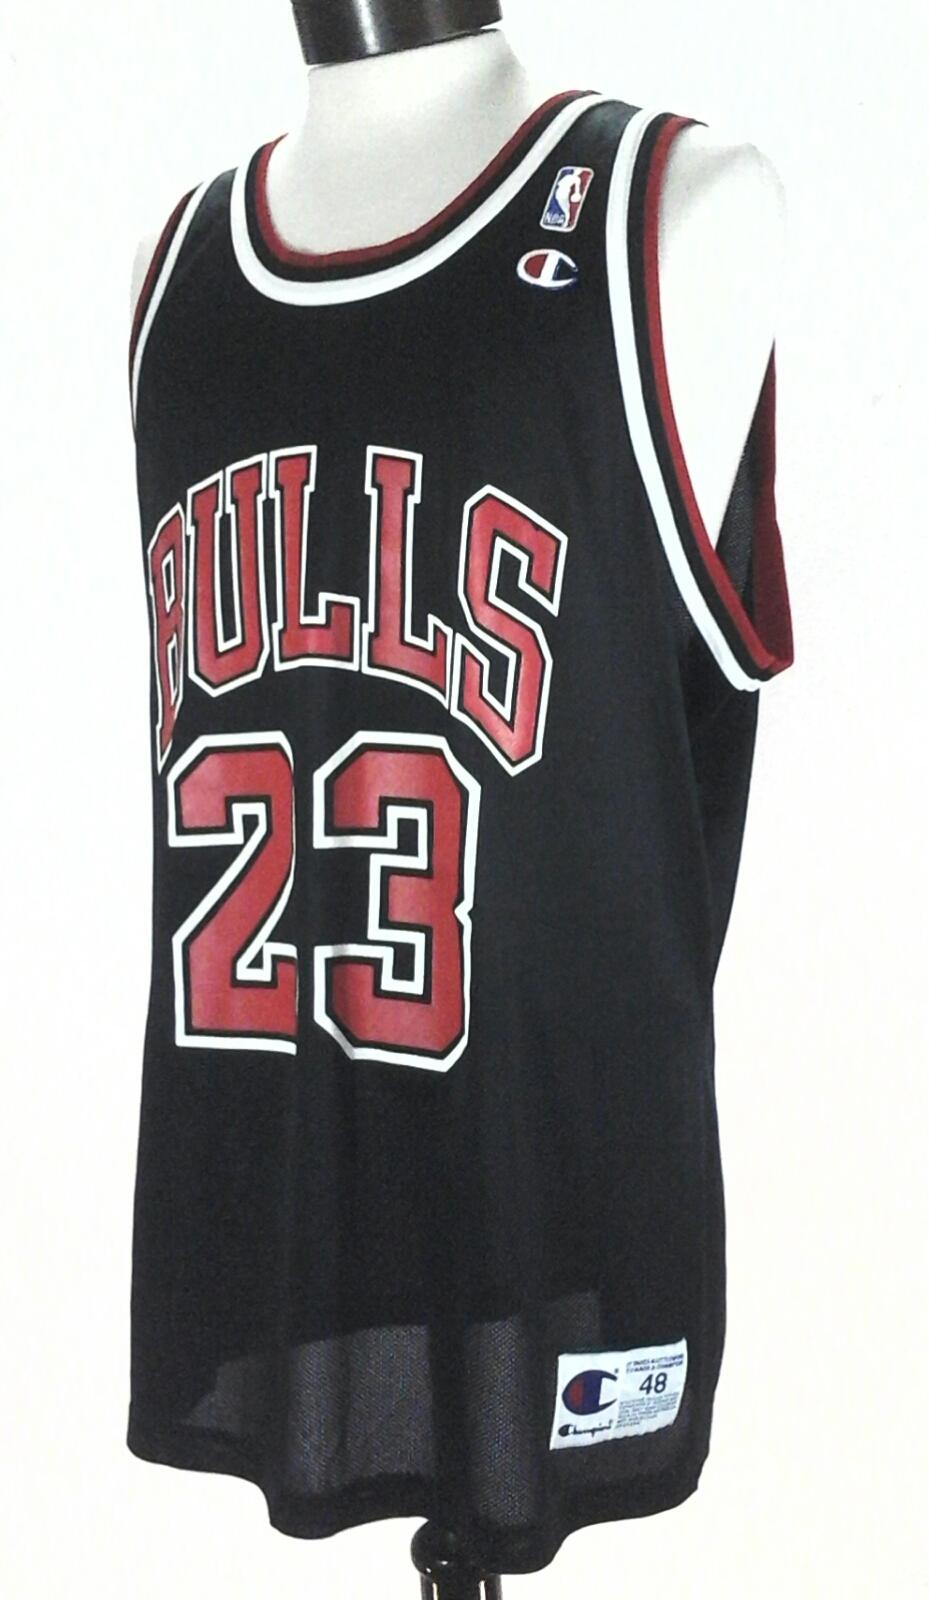 c04f2b0dca7 Details about JORDAN 23 Champion Jersey Chicago Bulls Basketball NBA Vintage  90's Men's 48 /XL